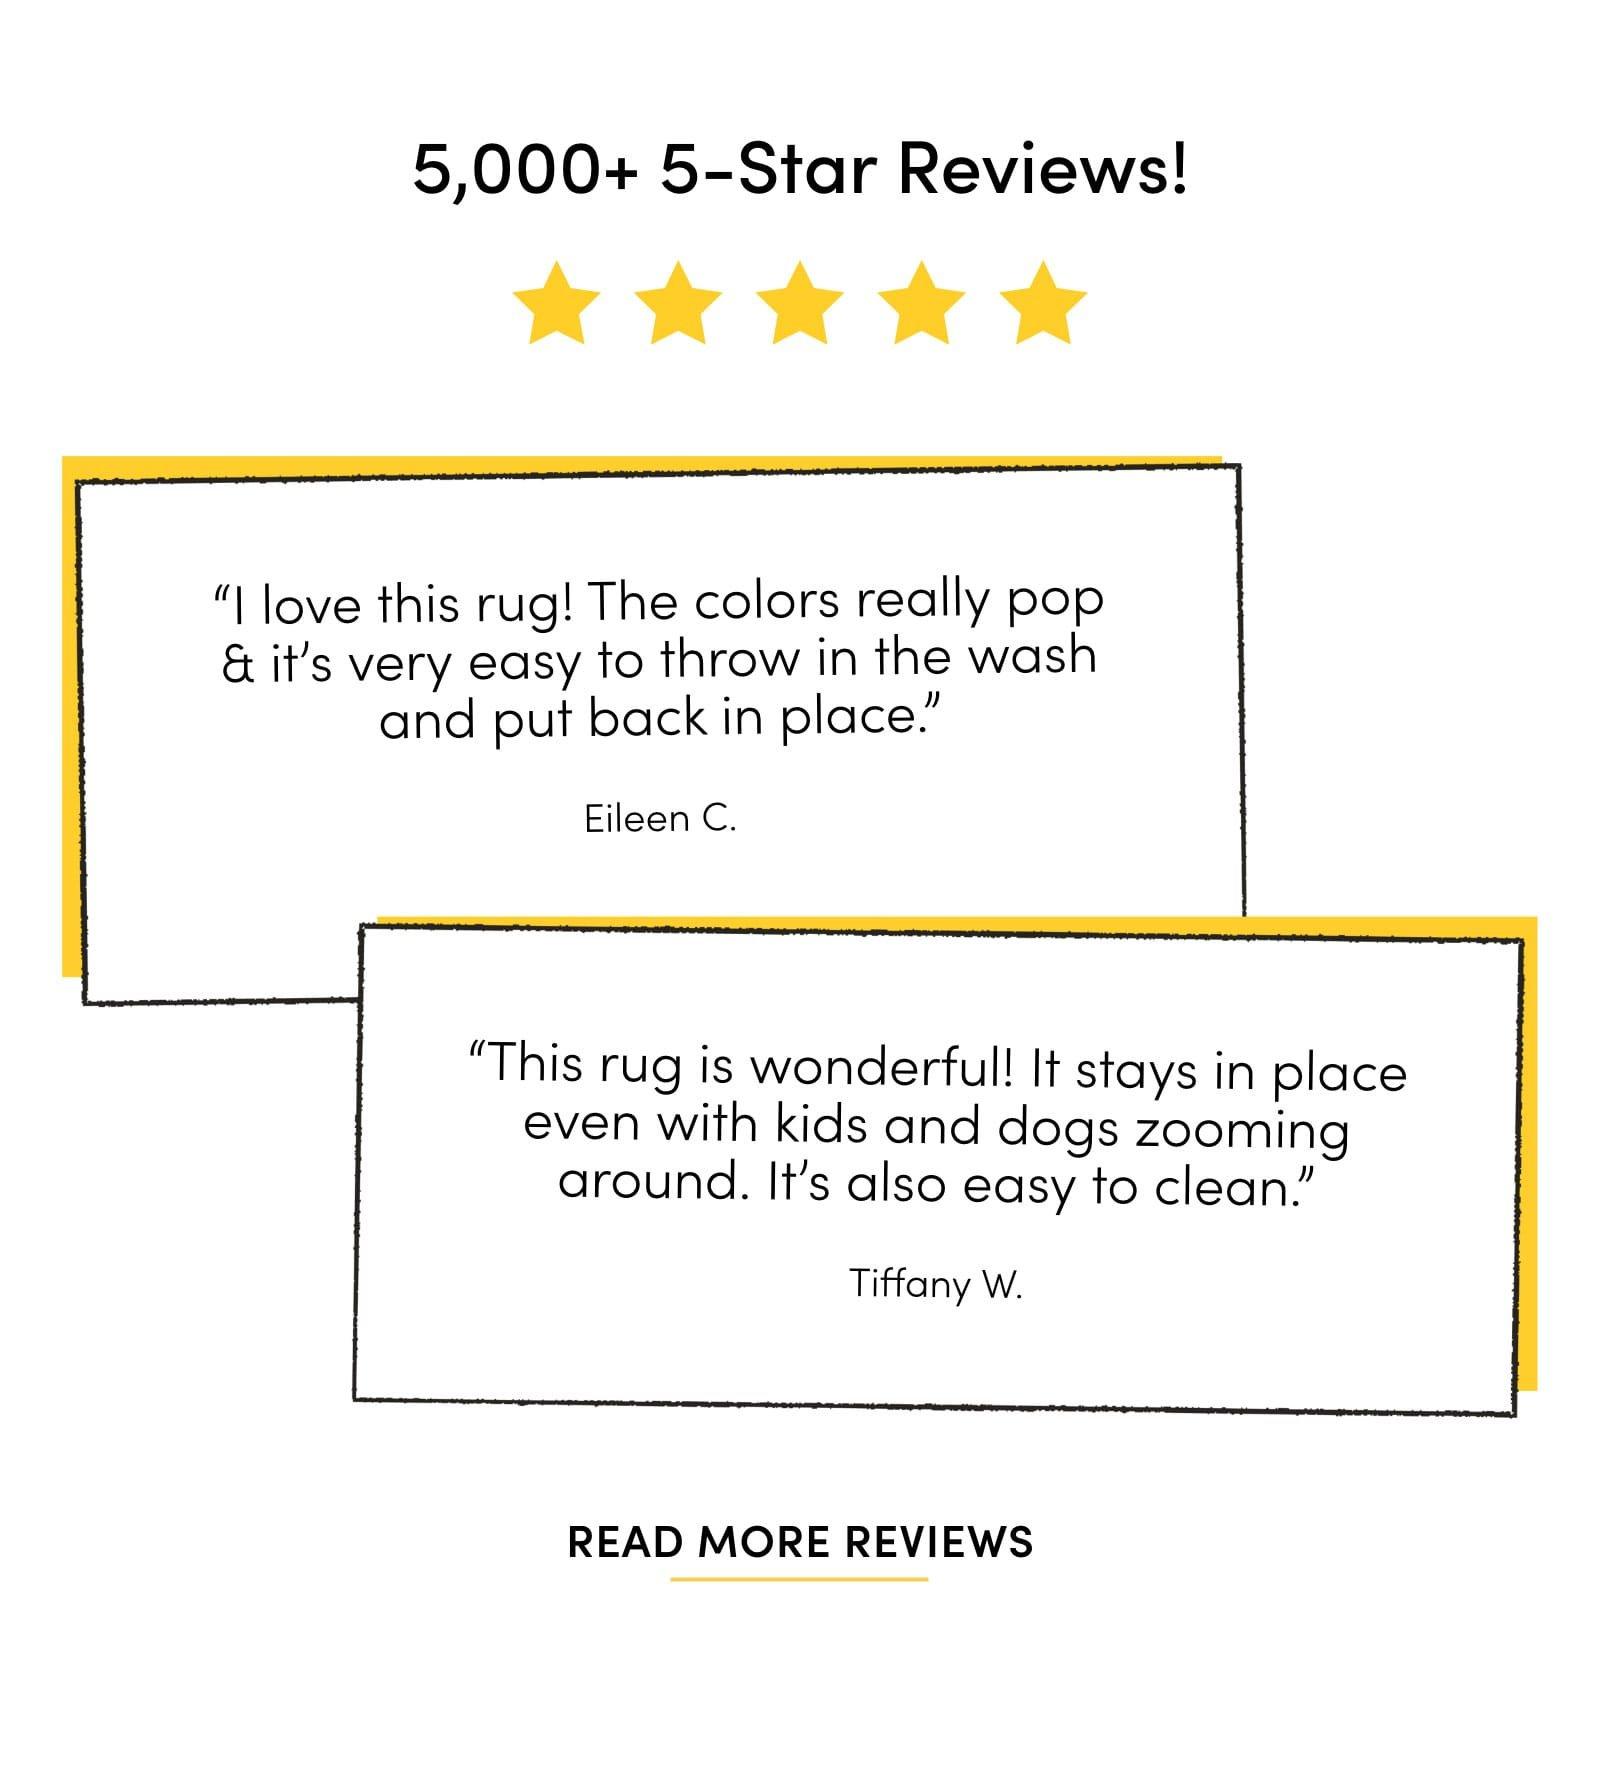 5,000+ 5-Star Reviews